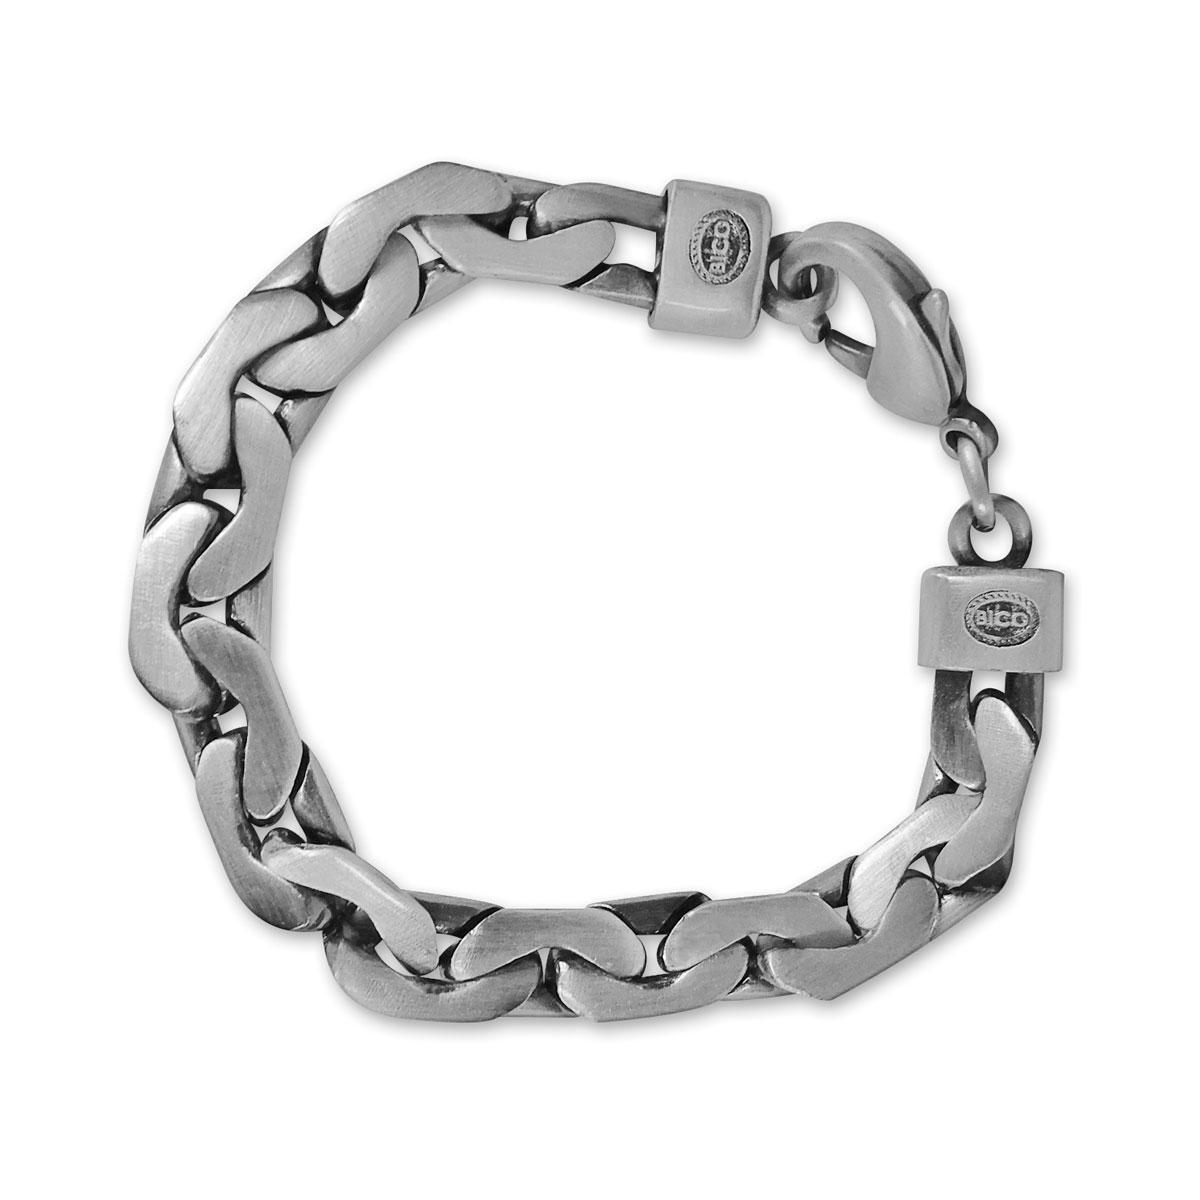 Bico Gothic Punk Rock 8″ Bracelet